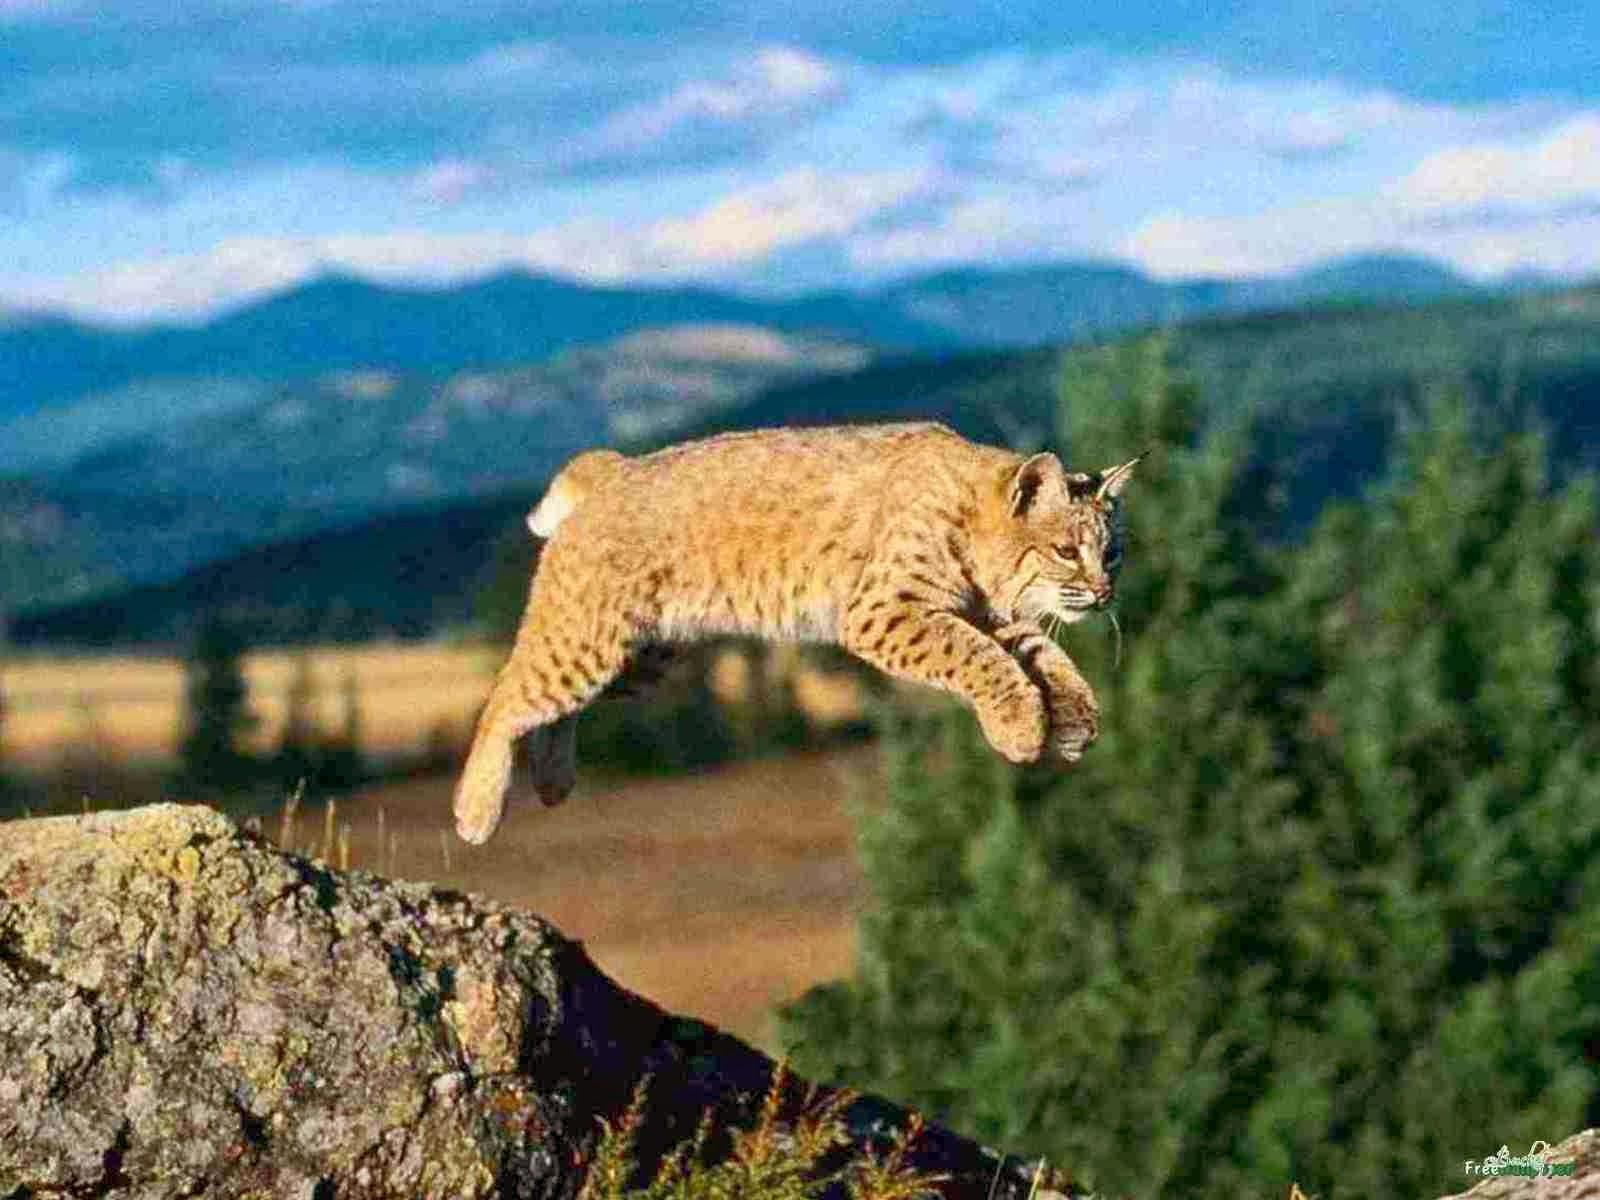 Hd Unique Wild Wallpaper: Amazing-Beautiful-Rabbit-Dangerous-Wildlife-Predators